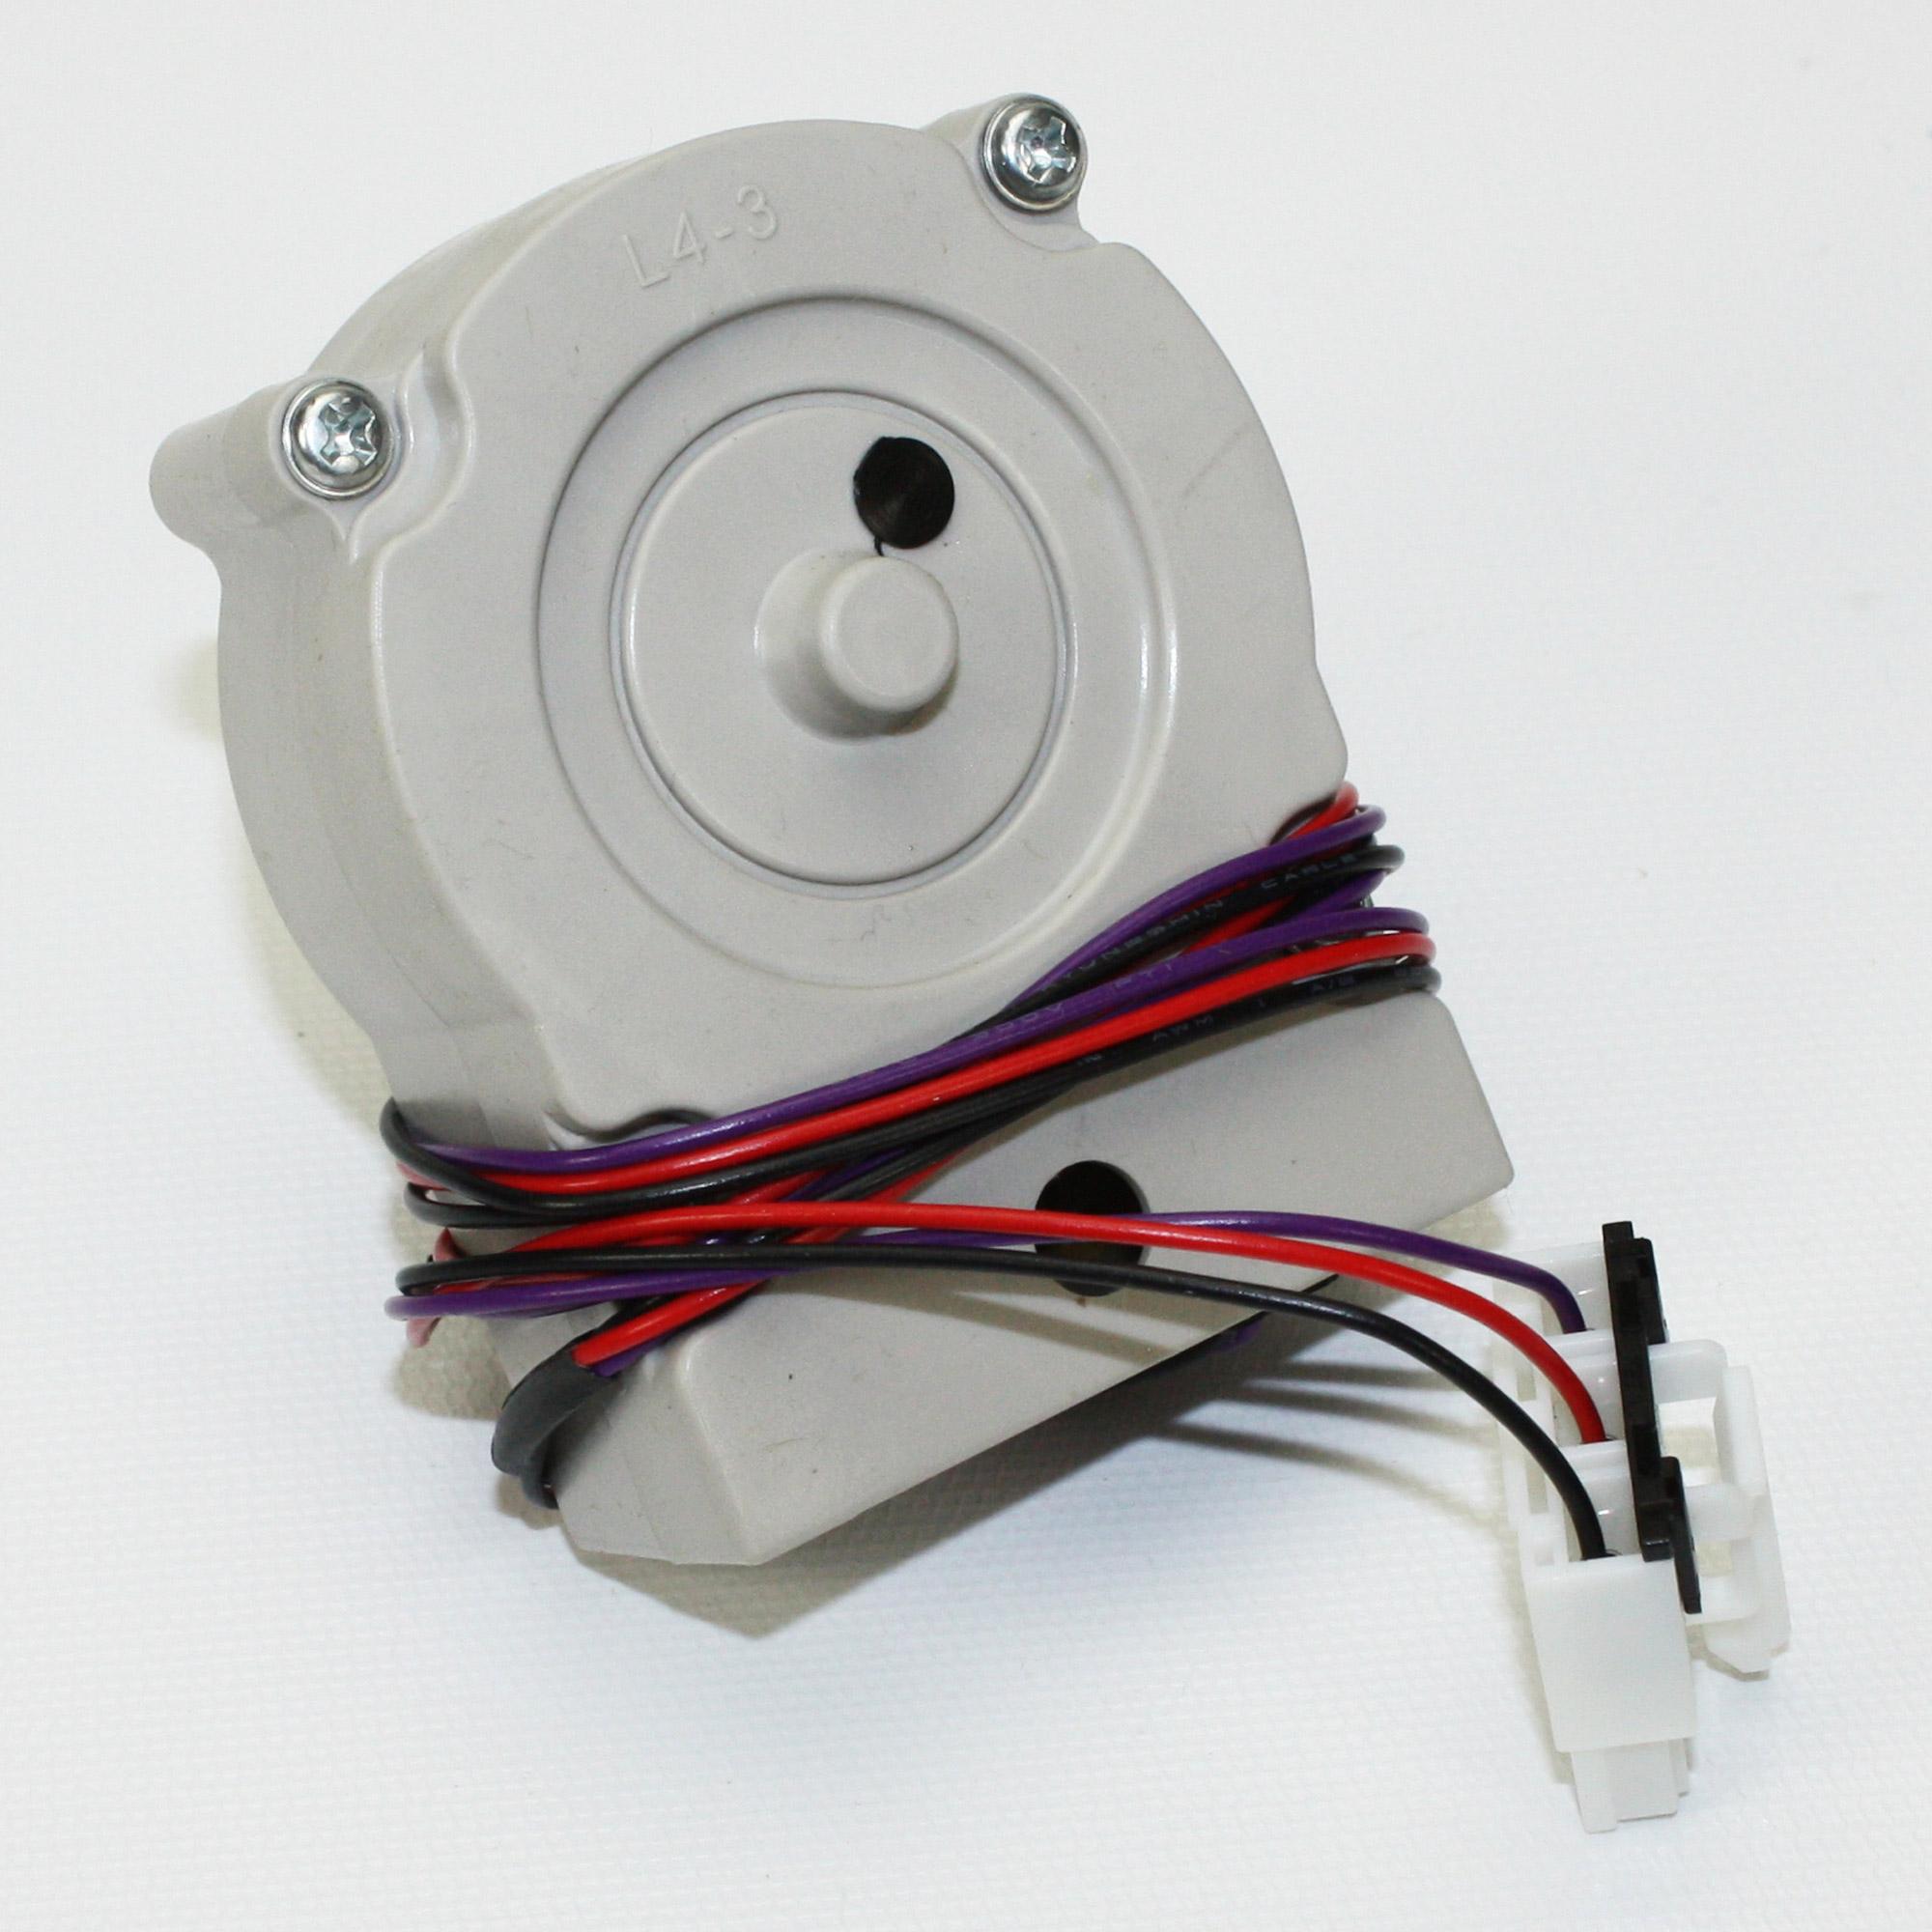 Er4681jb1027c for 4681jb1027c lg refrigerator fan motor ebay for Hotpoint refrigerator condenser fan motor